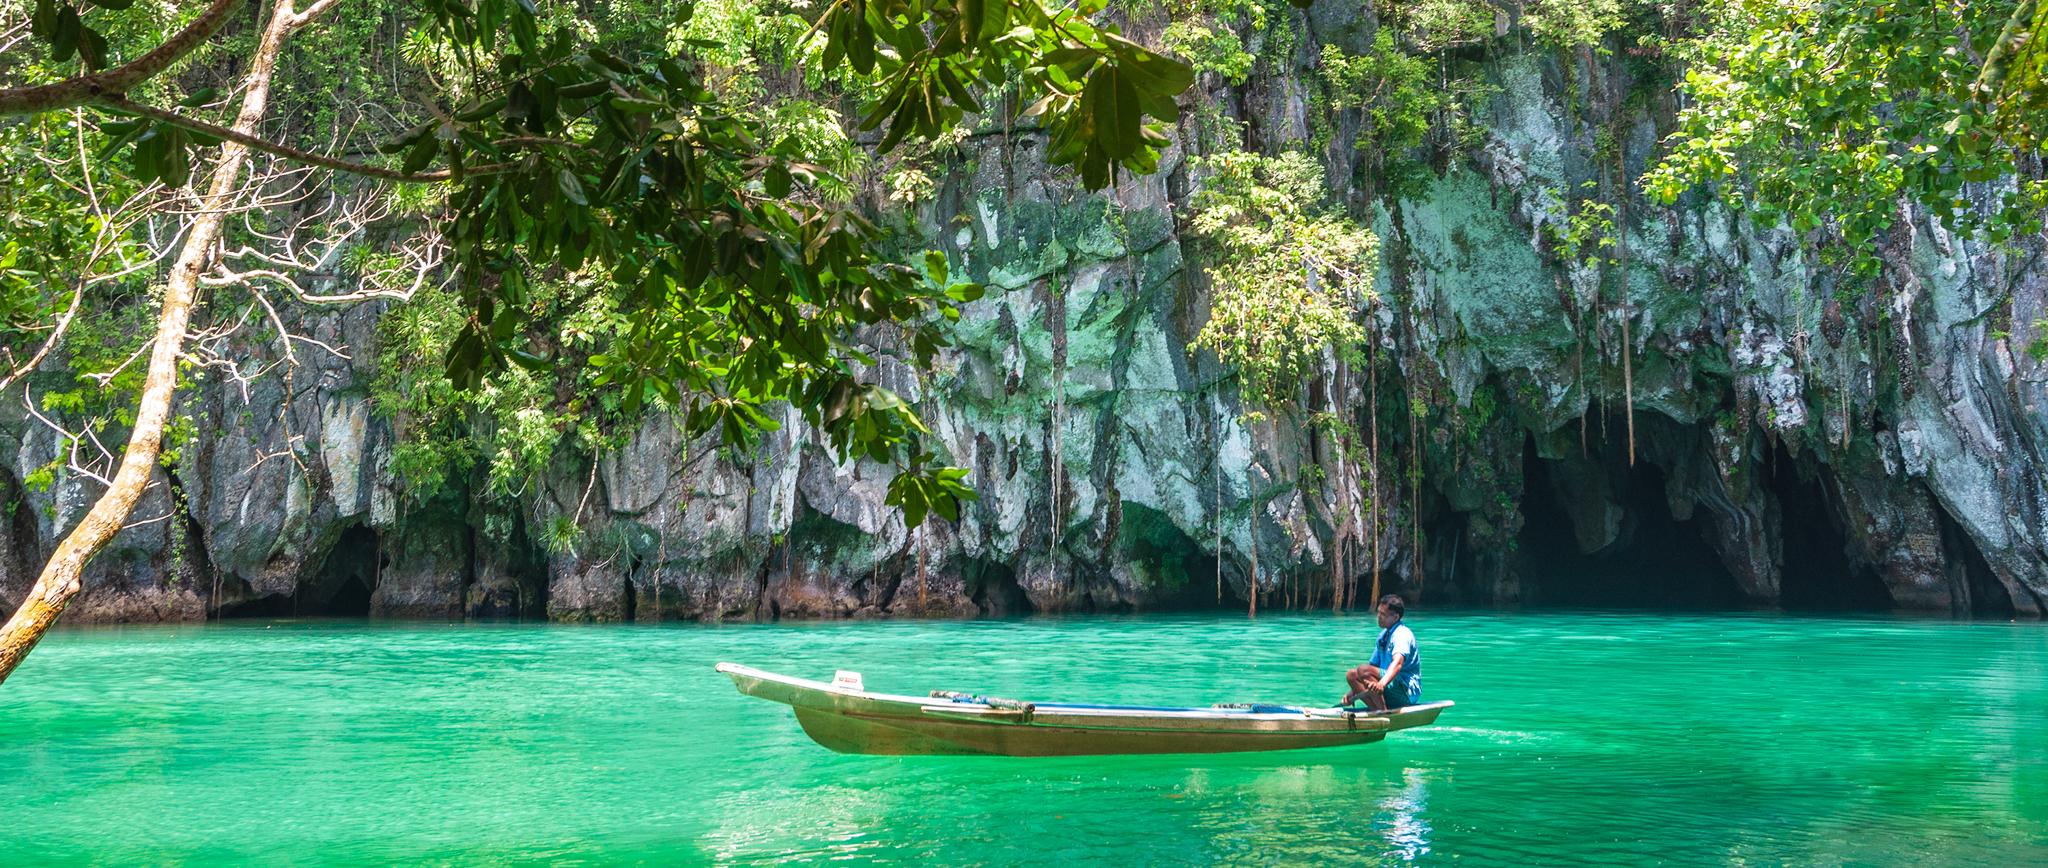 9 Must-Visit Philippines UNESCO World Heritage Sites: Natural Wonders, Historic & Heritage Sites